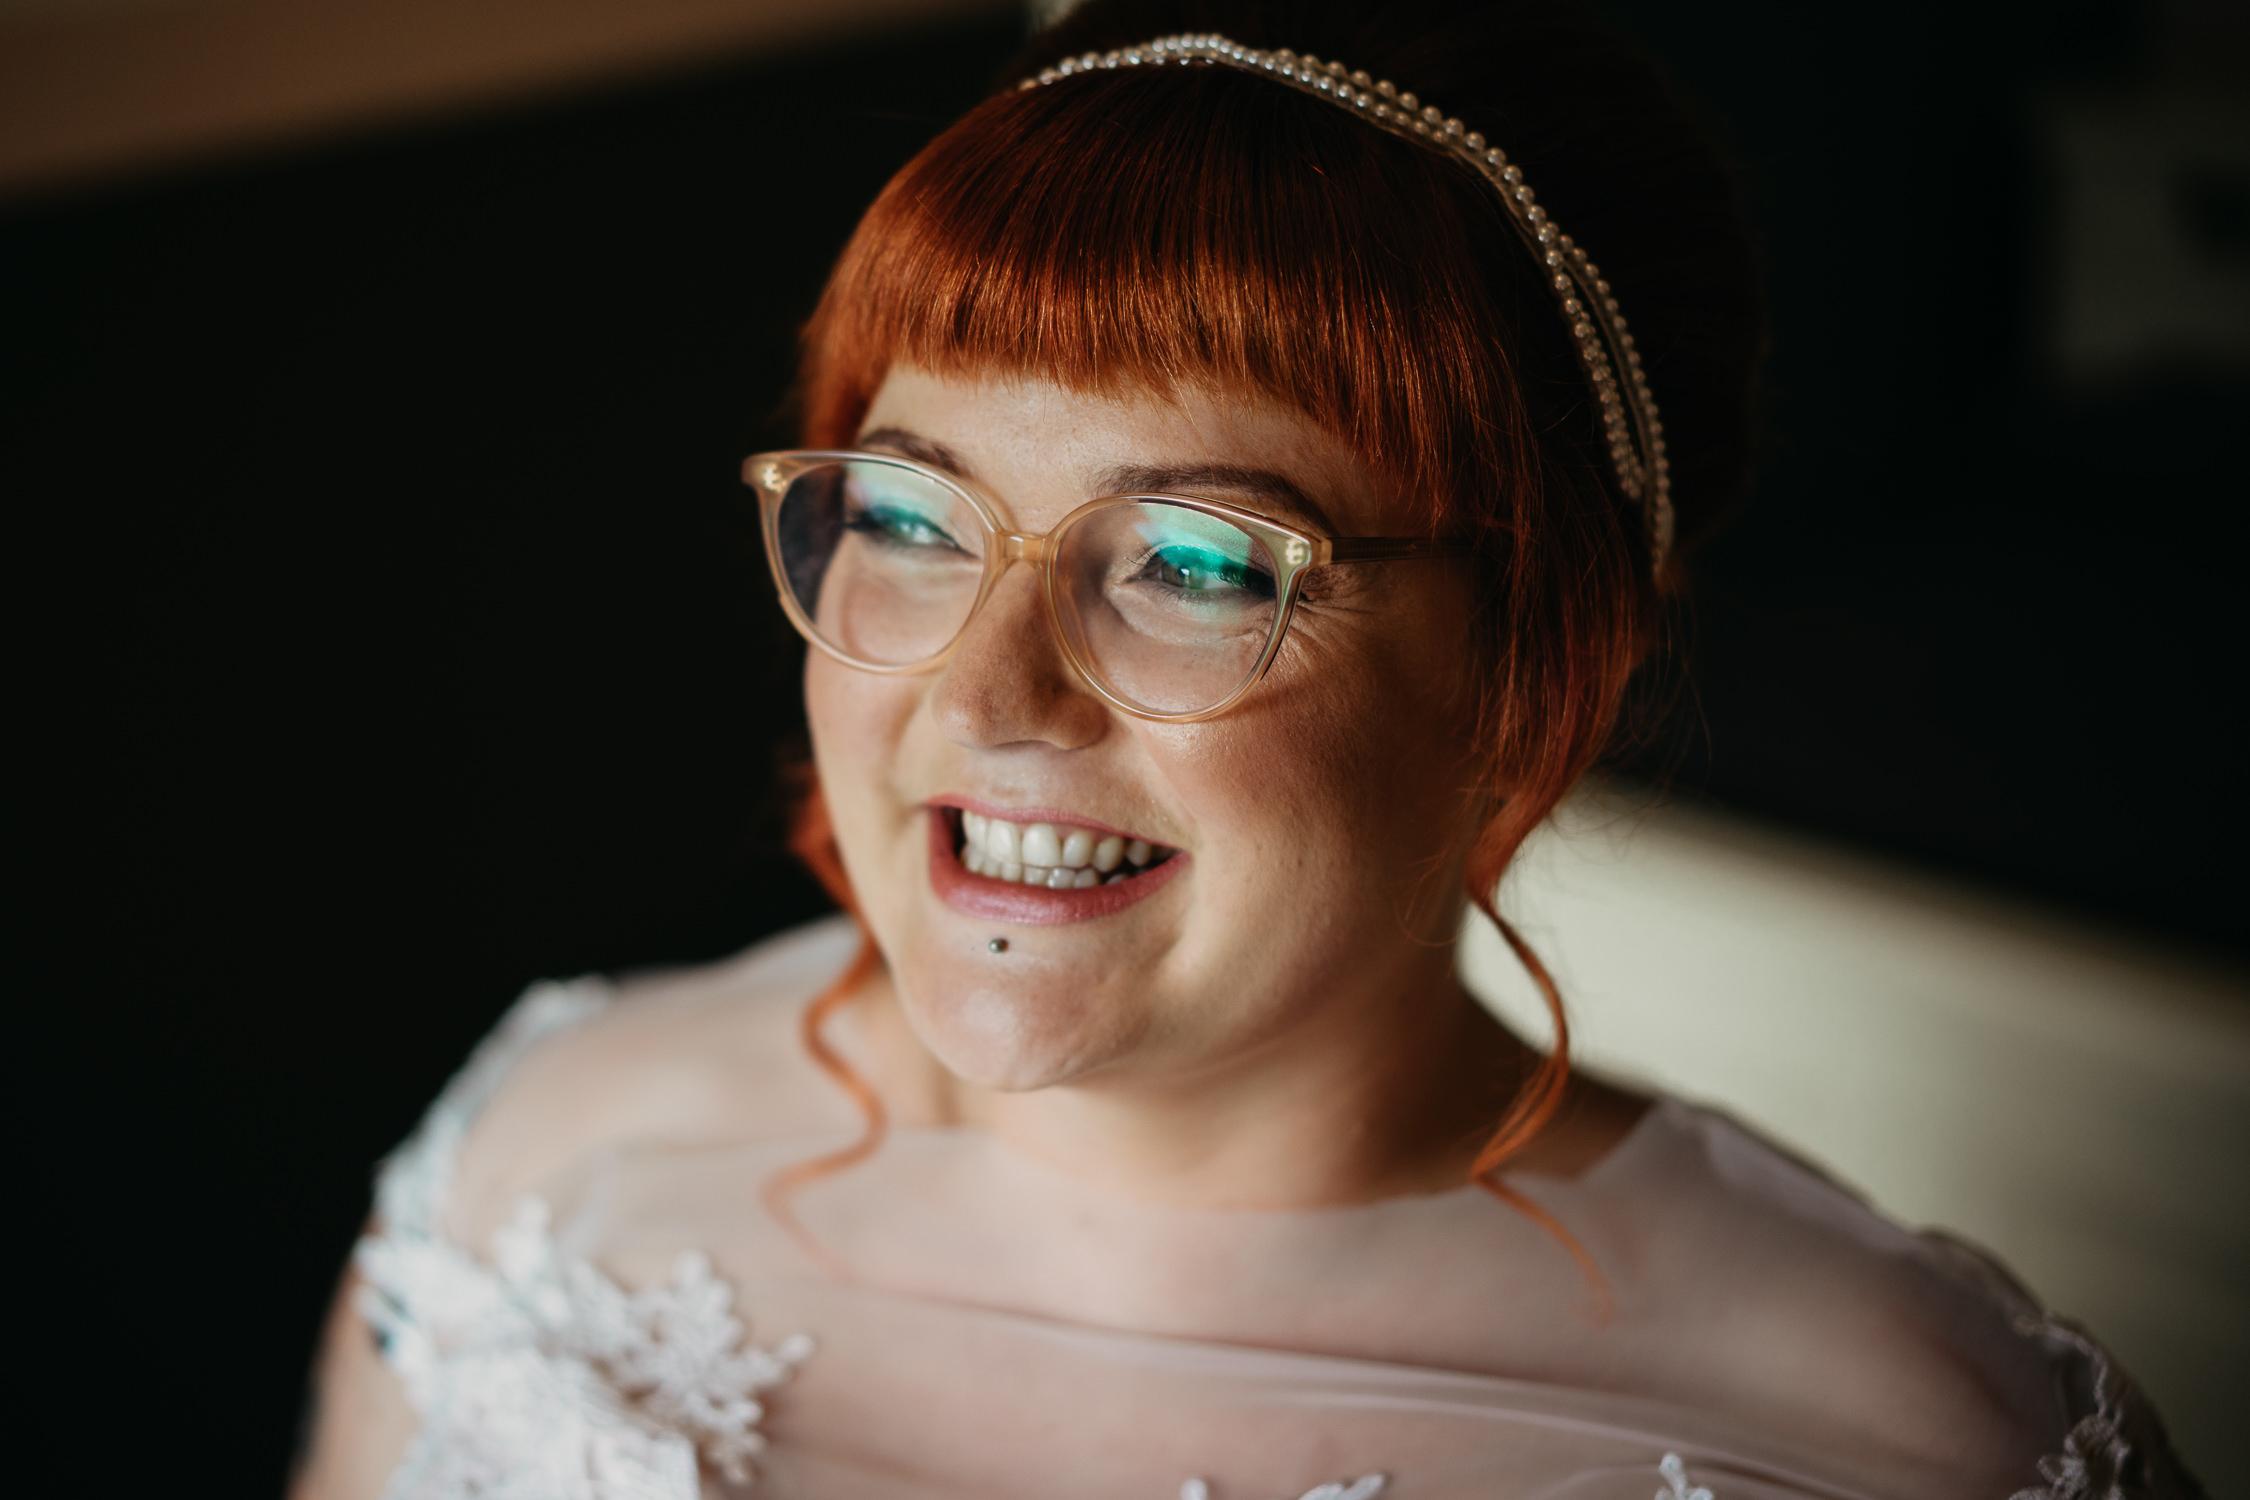 amsterdam-wedding-photographer-bruidsfotografie-trouwfotograaf-mark-hadden-Lucie-Luuk-064.jpg